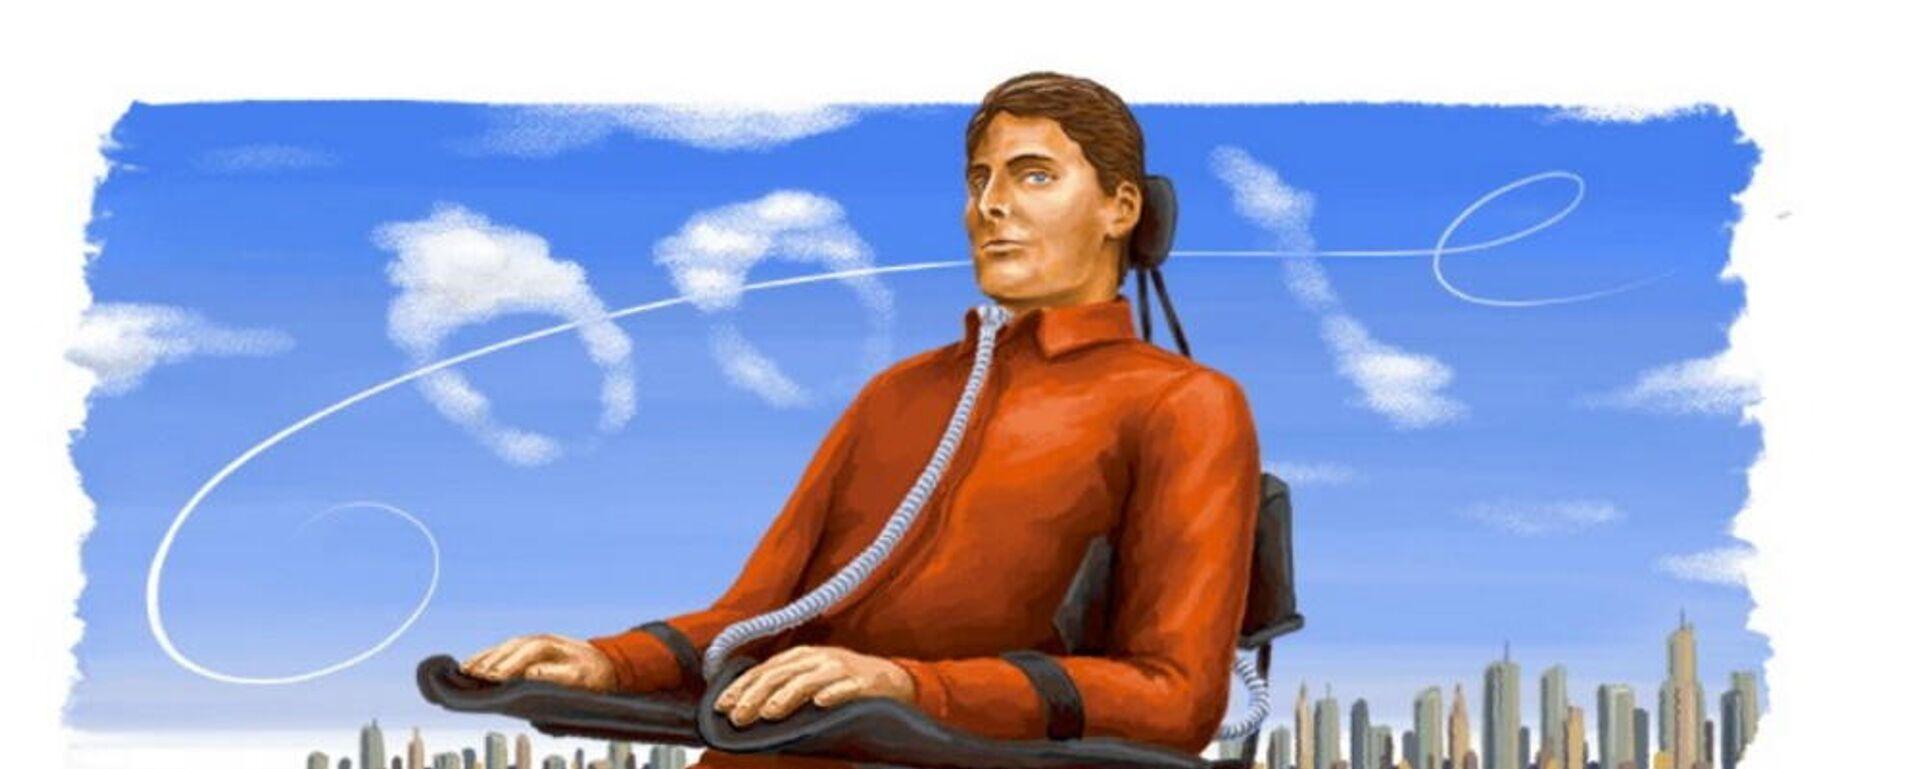 Google Doodle για τον Κρίστοφερ Ριβ, 25 Σεπτεμβρίου 2021 - Sputnik Ελλάδα, 1920, 25.09.2021